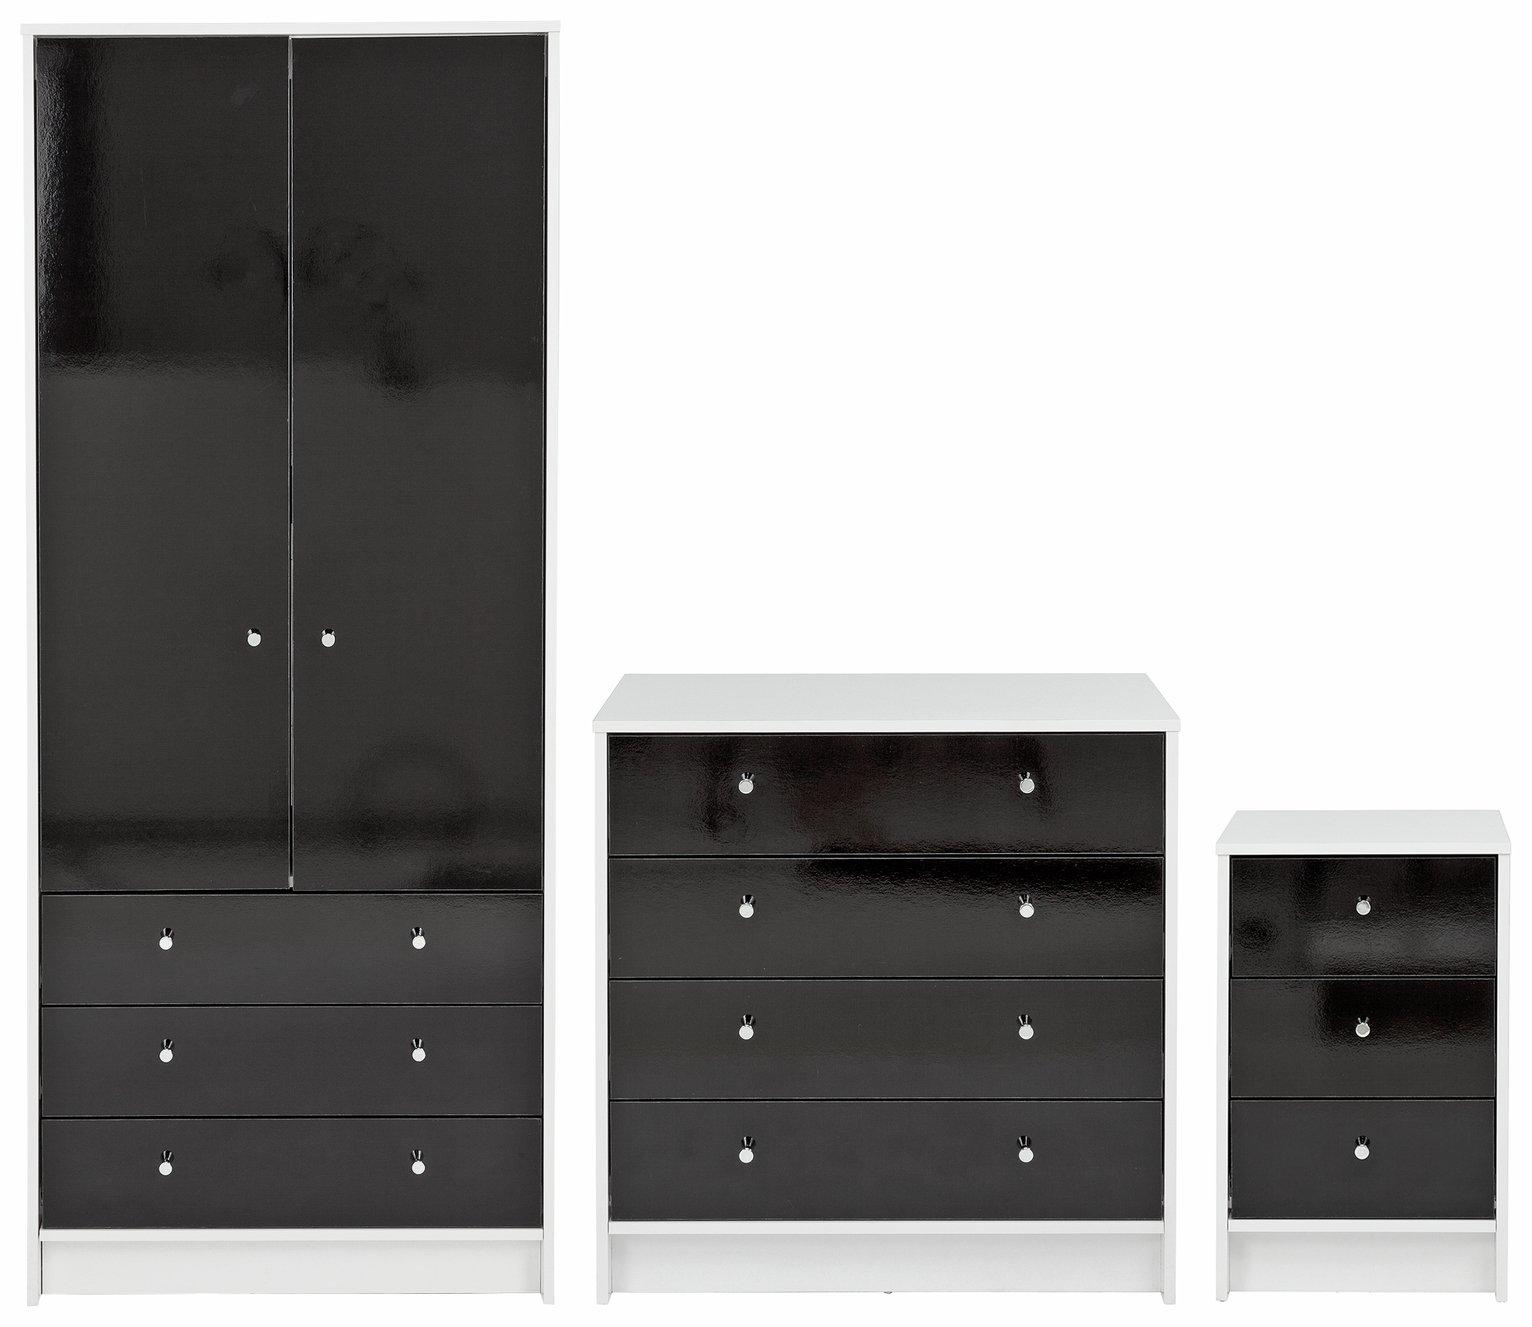 argos bedroom furniture.  Bedroom Argos Home Malibu 3 Pc Bedroom Package Throughout Furniture U